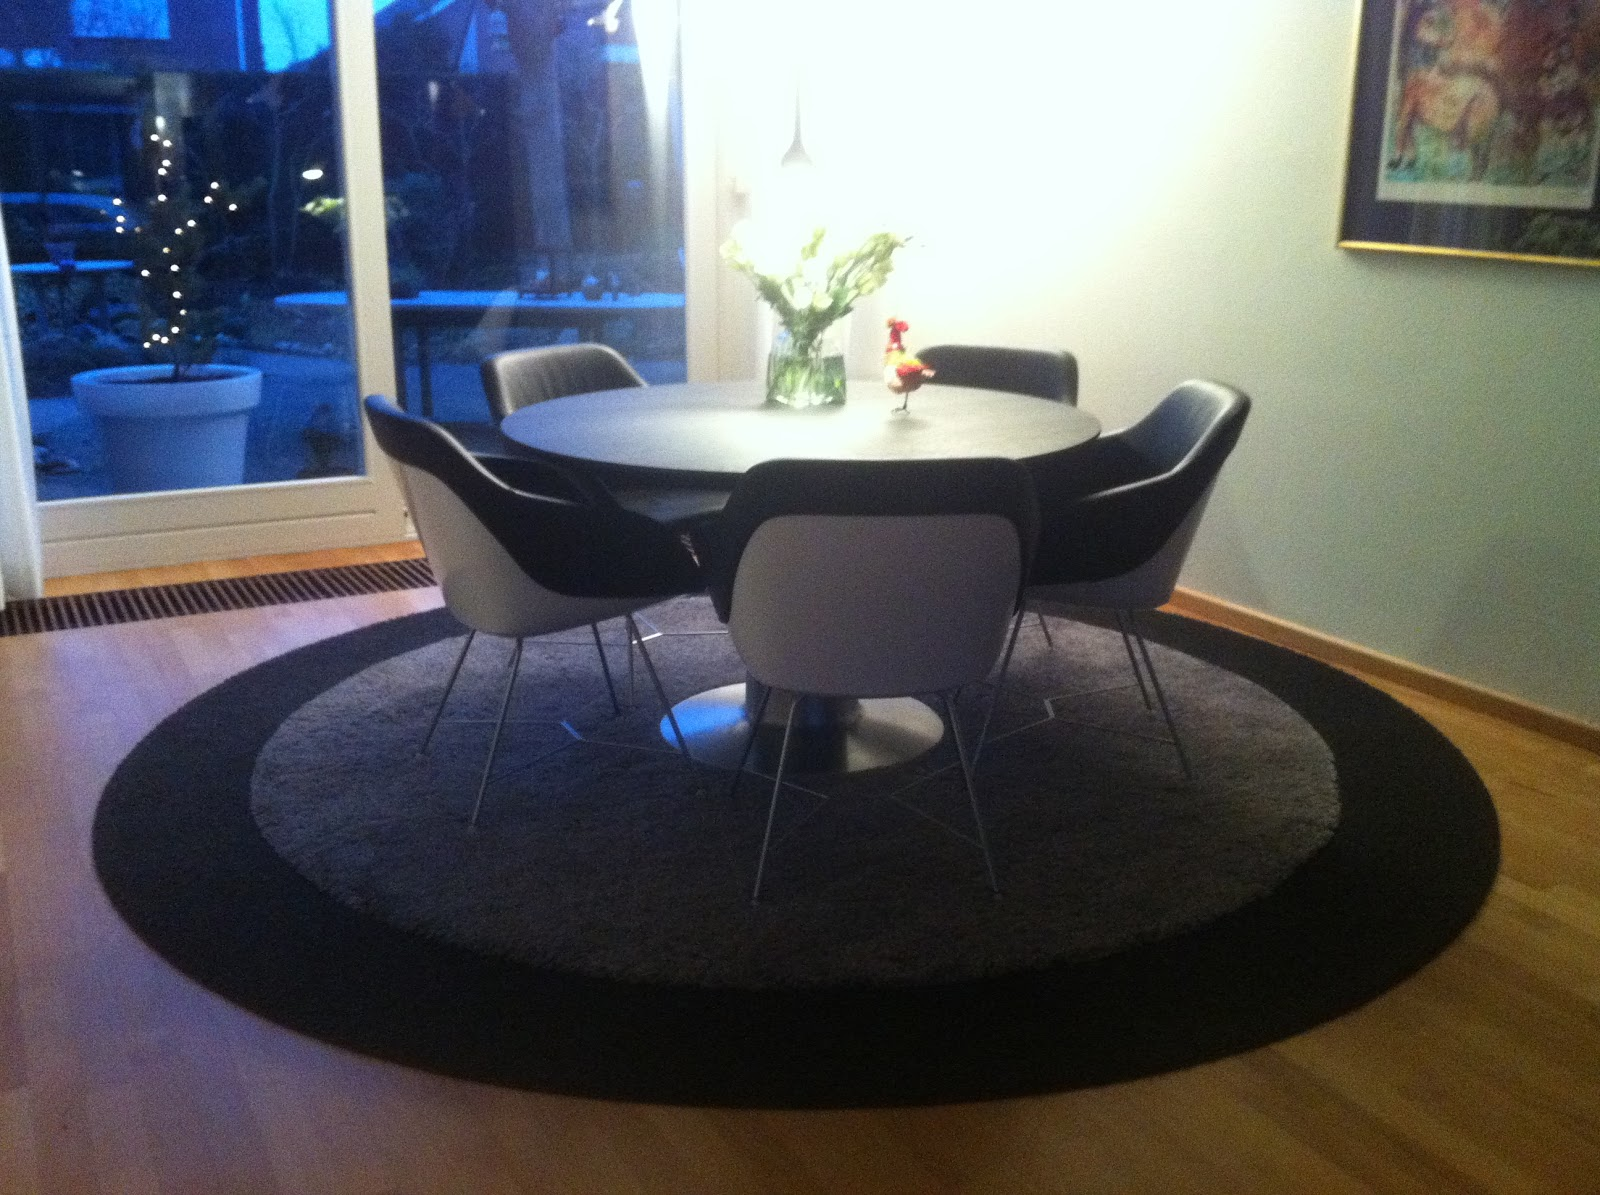 Ploemen interieur walter knoll turtle stoelen en arco balance tafel - Tafel nachtkastje balances ...